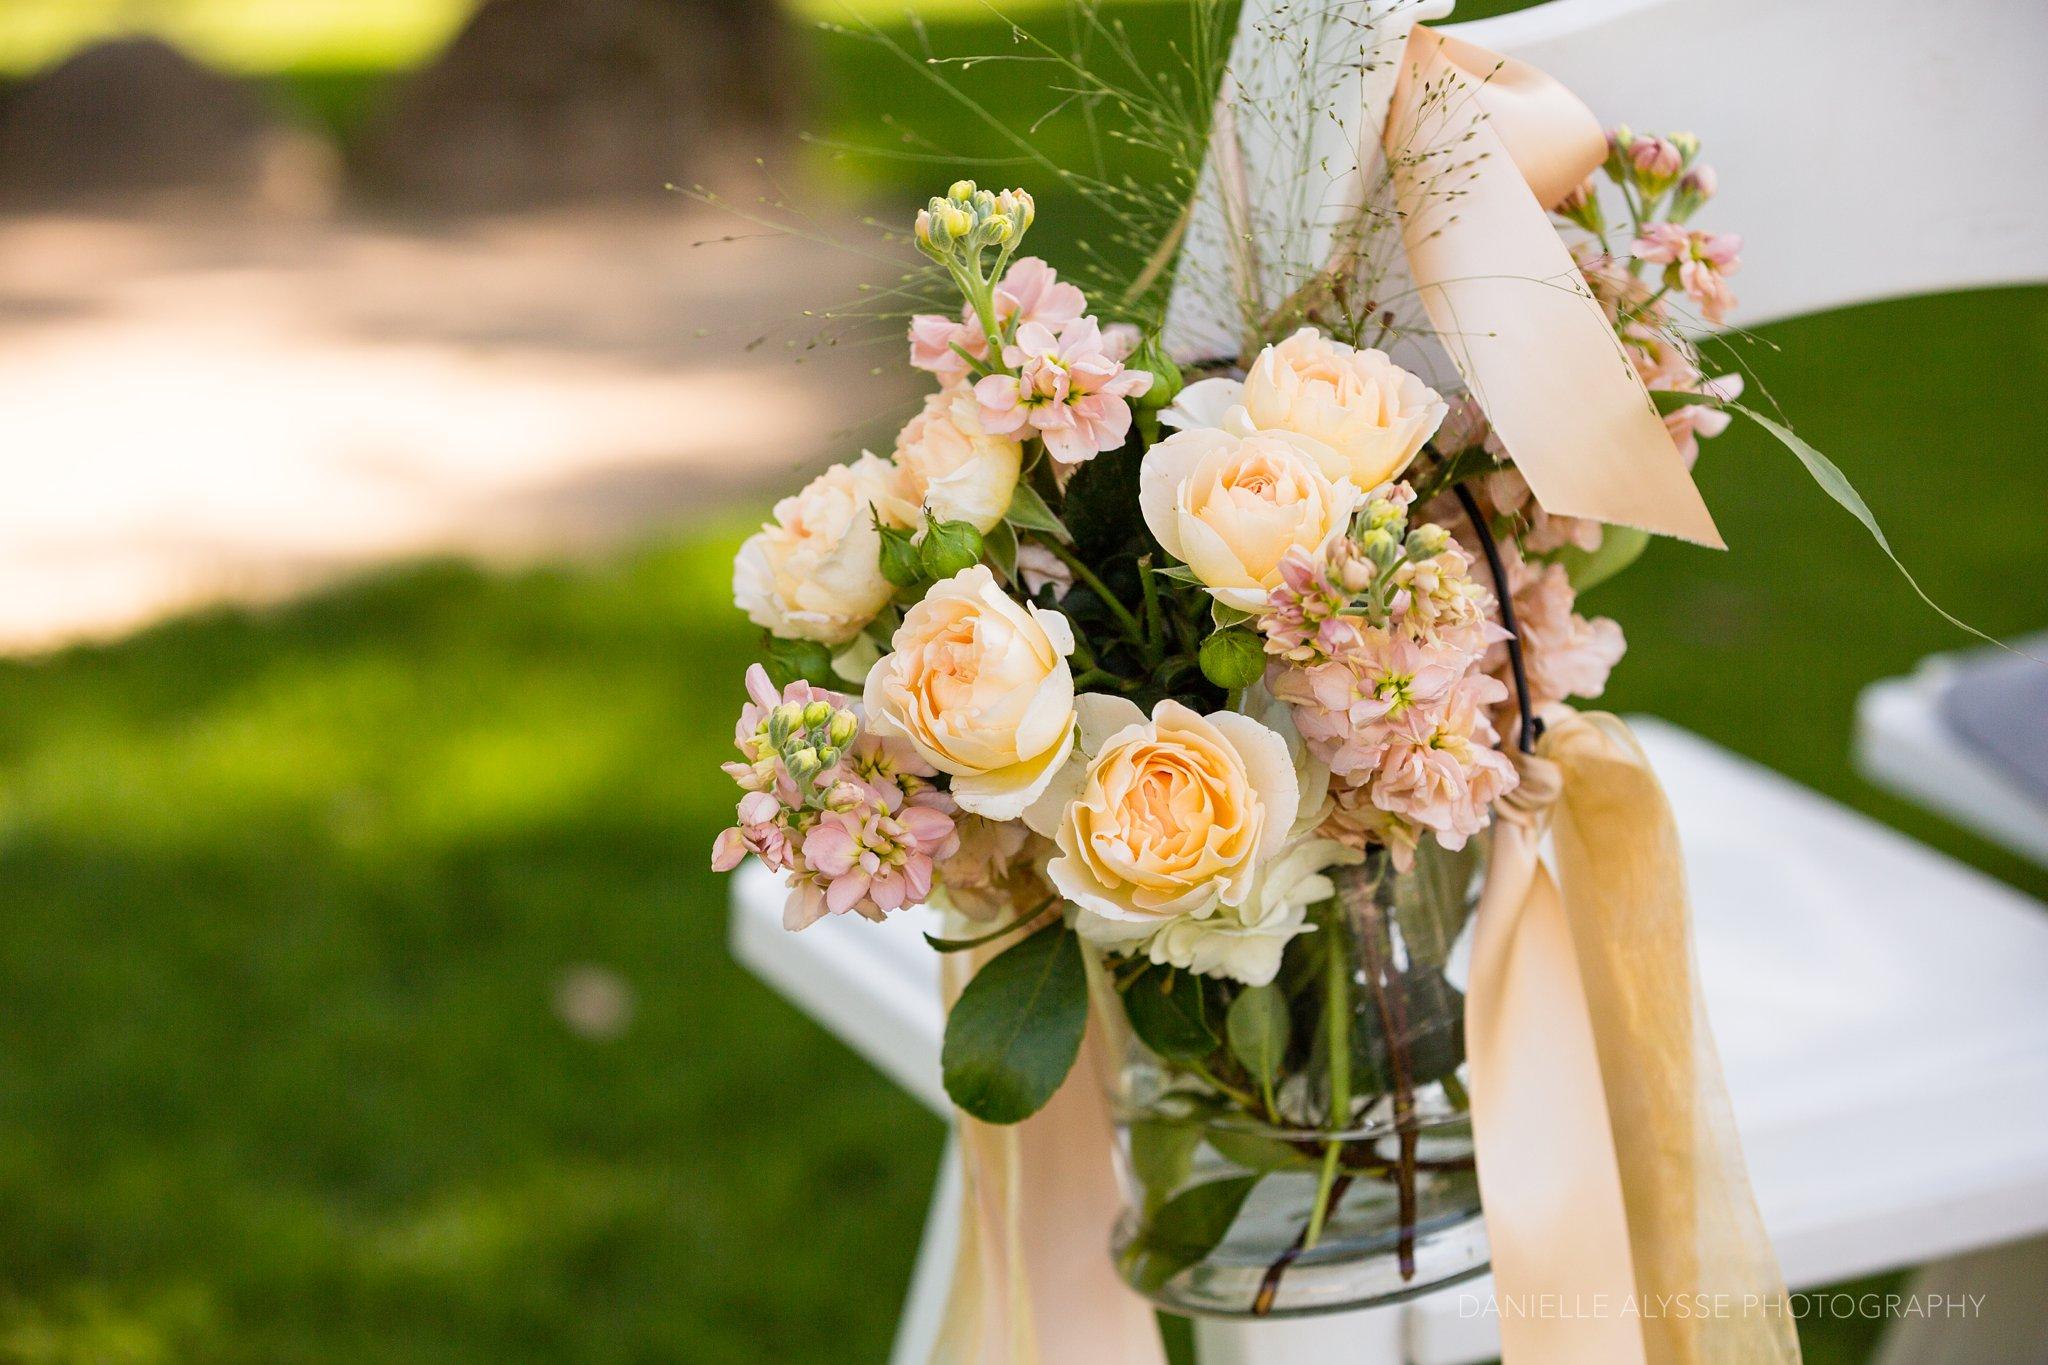 170507_blog_megan_david_wedding_loomis_flower_farm_inn_danielle_alysse_photography_sacramento_photographer0125_WEB.jpg